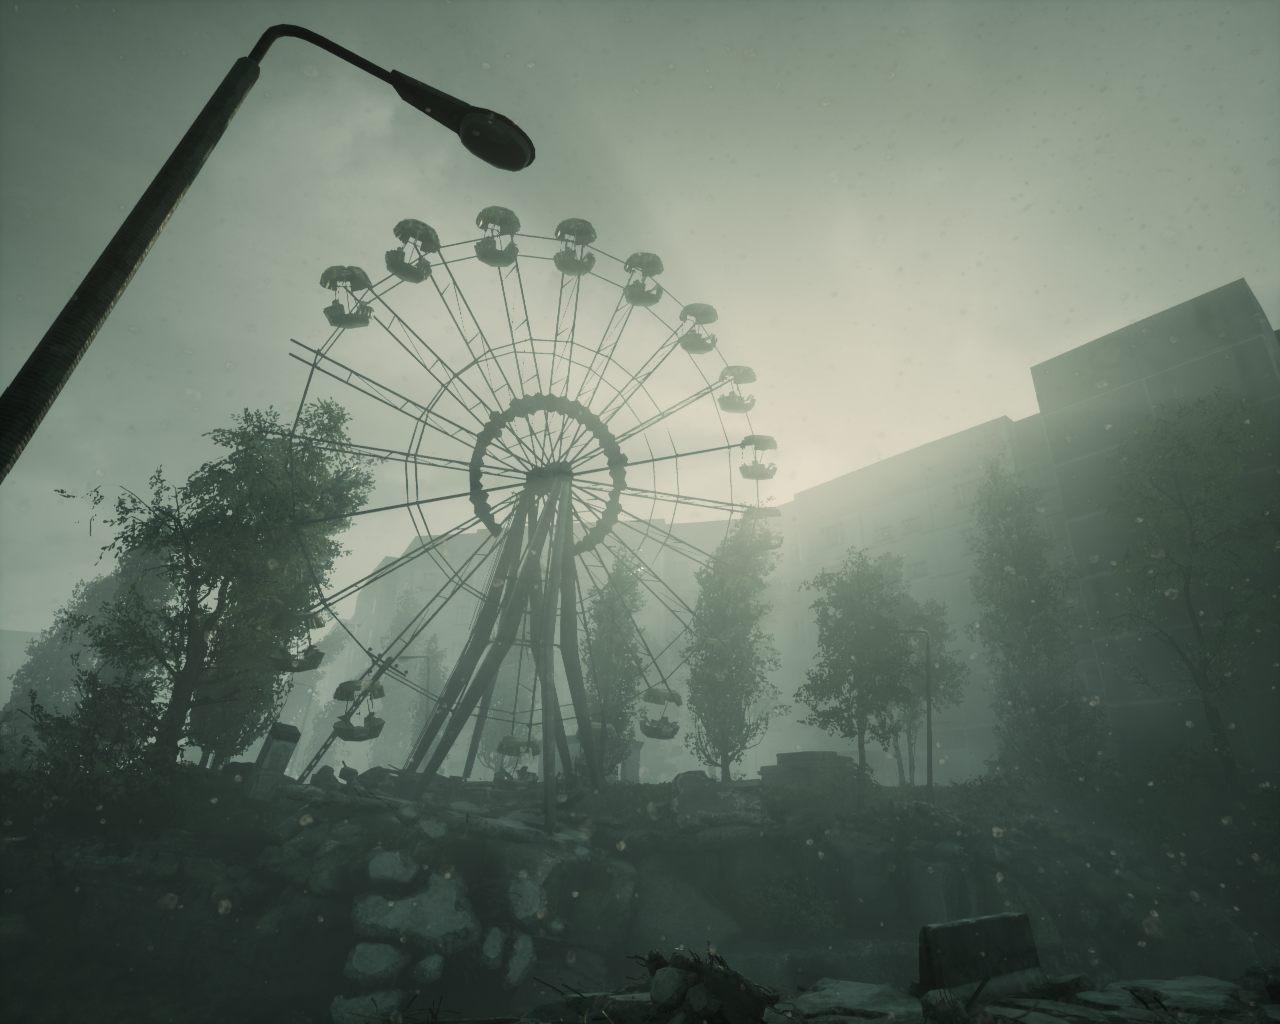 ChernobylGame-Win64-Shipping 2021-07-29 01-37-35-99.bmp.jpg